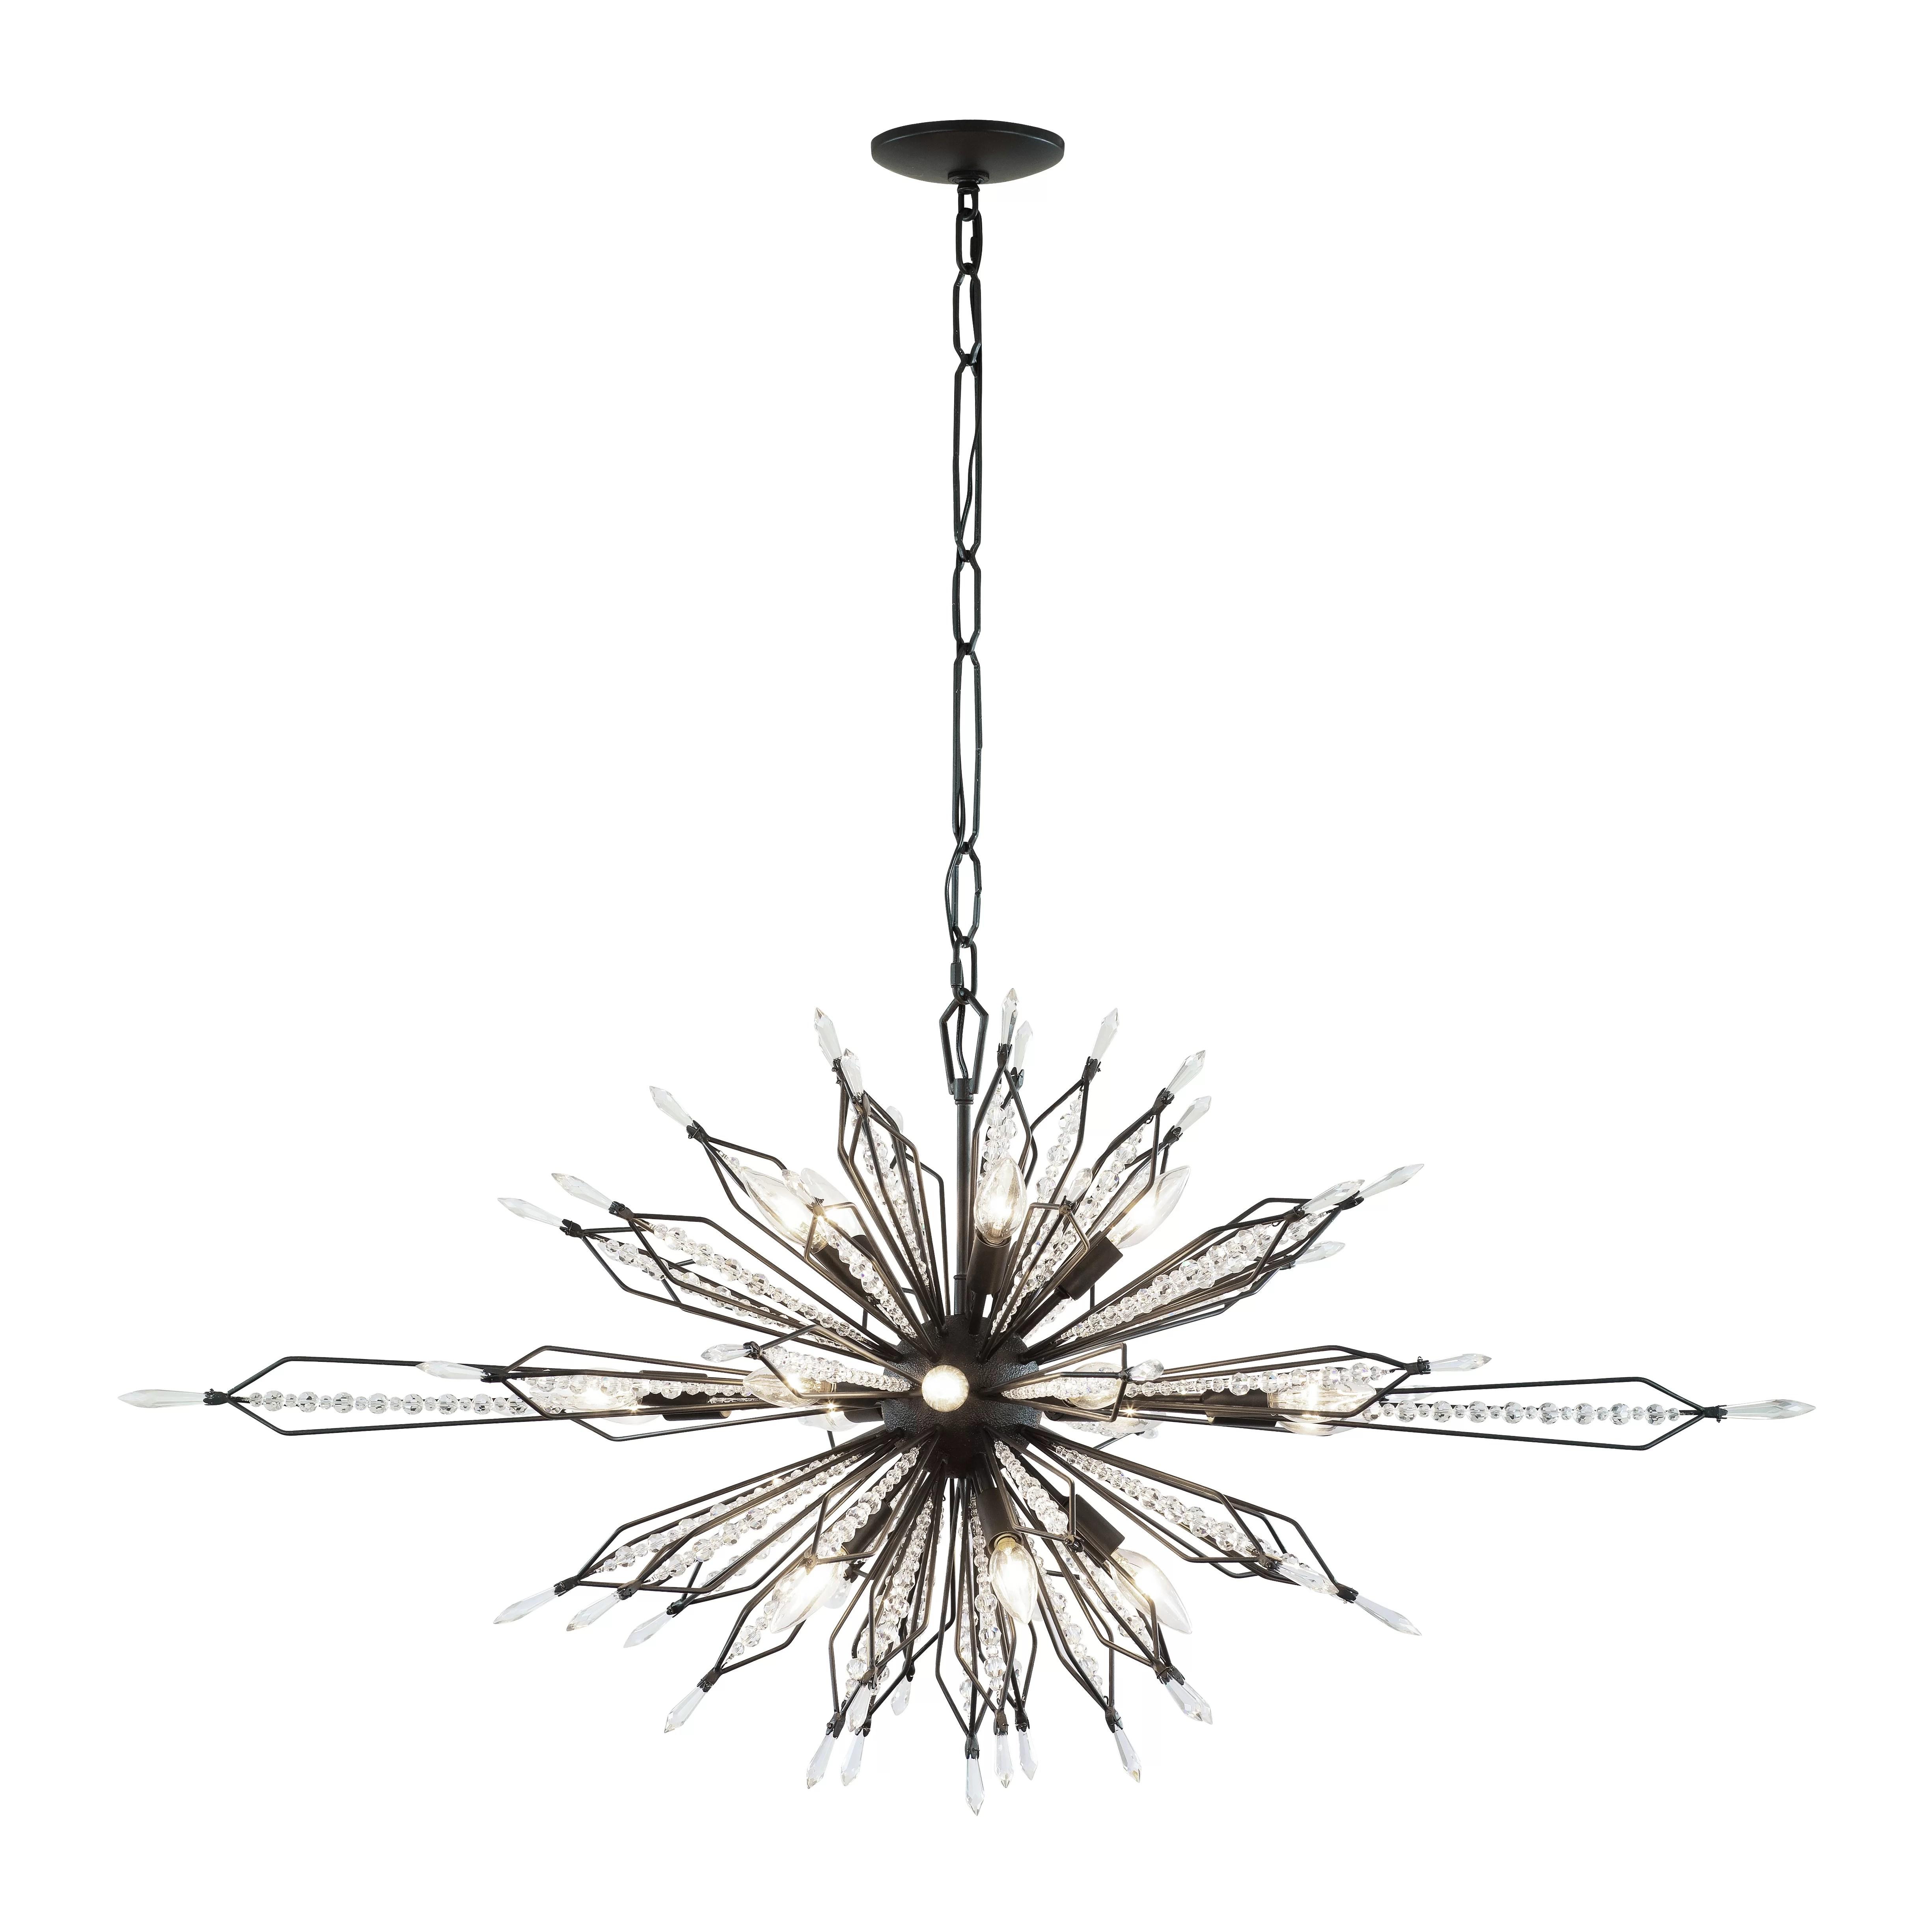 House Of Hampton Rasco Oval Linear 16 Light Sputnik